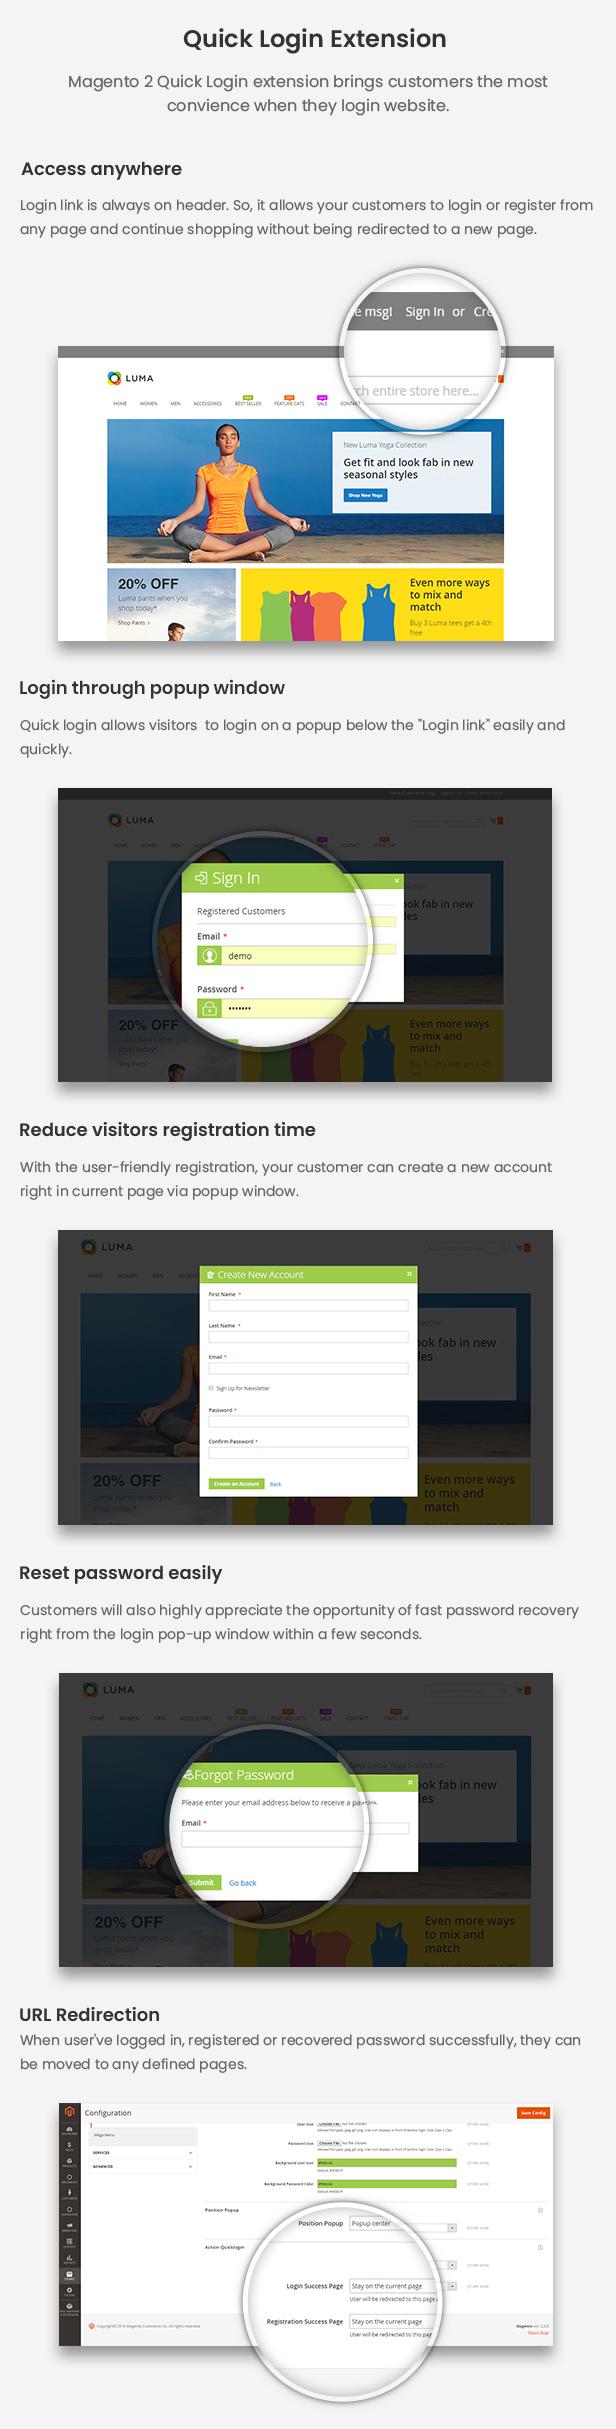 Printshop - Responsive Magento Printing Theme - 29